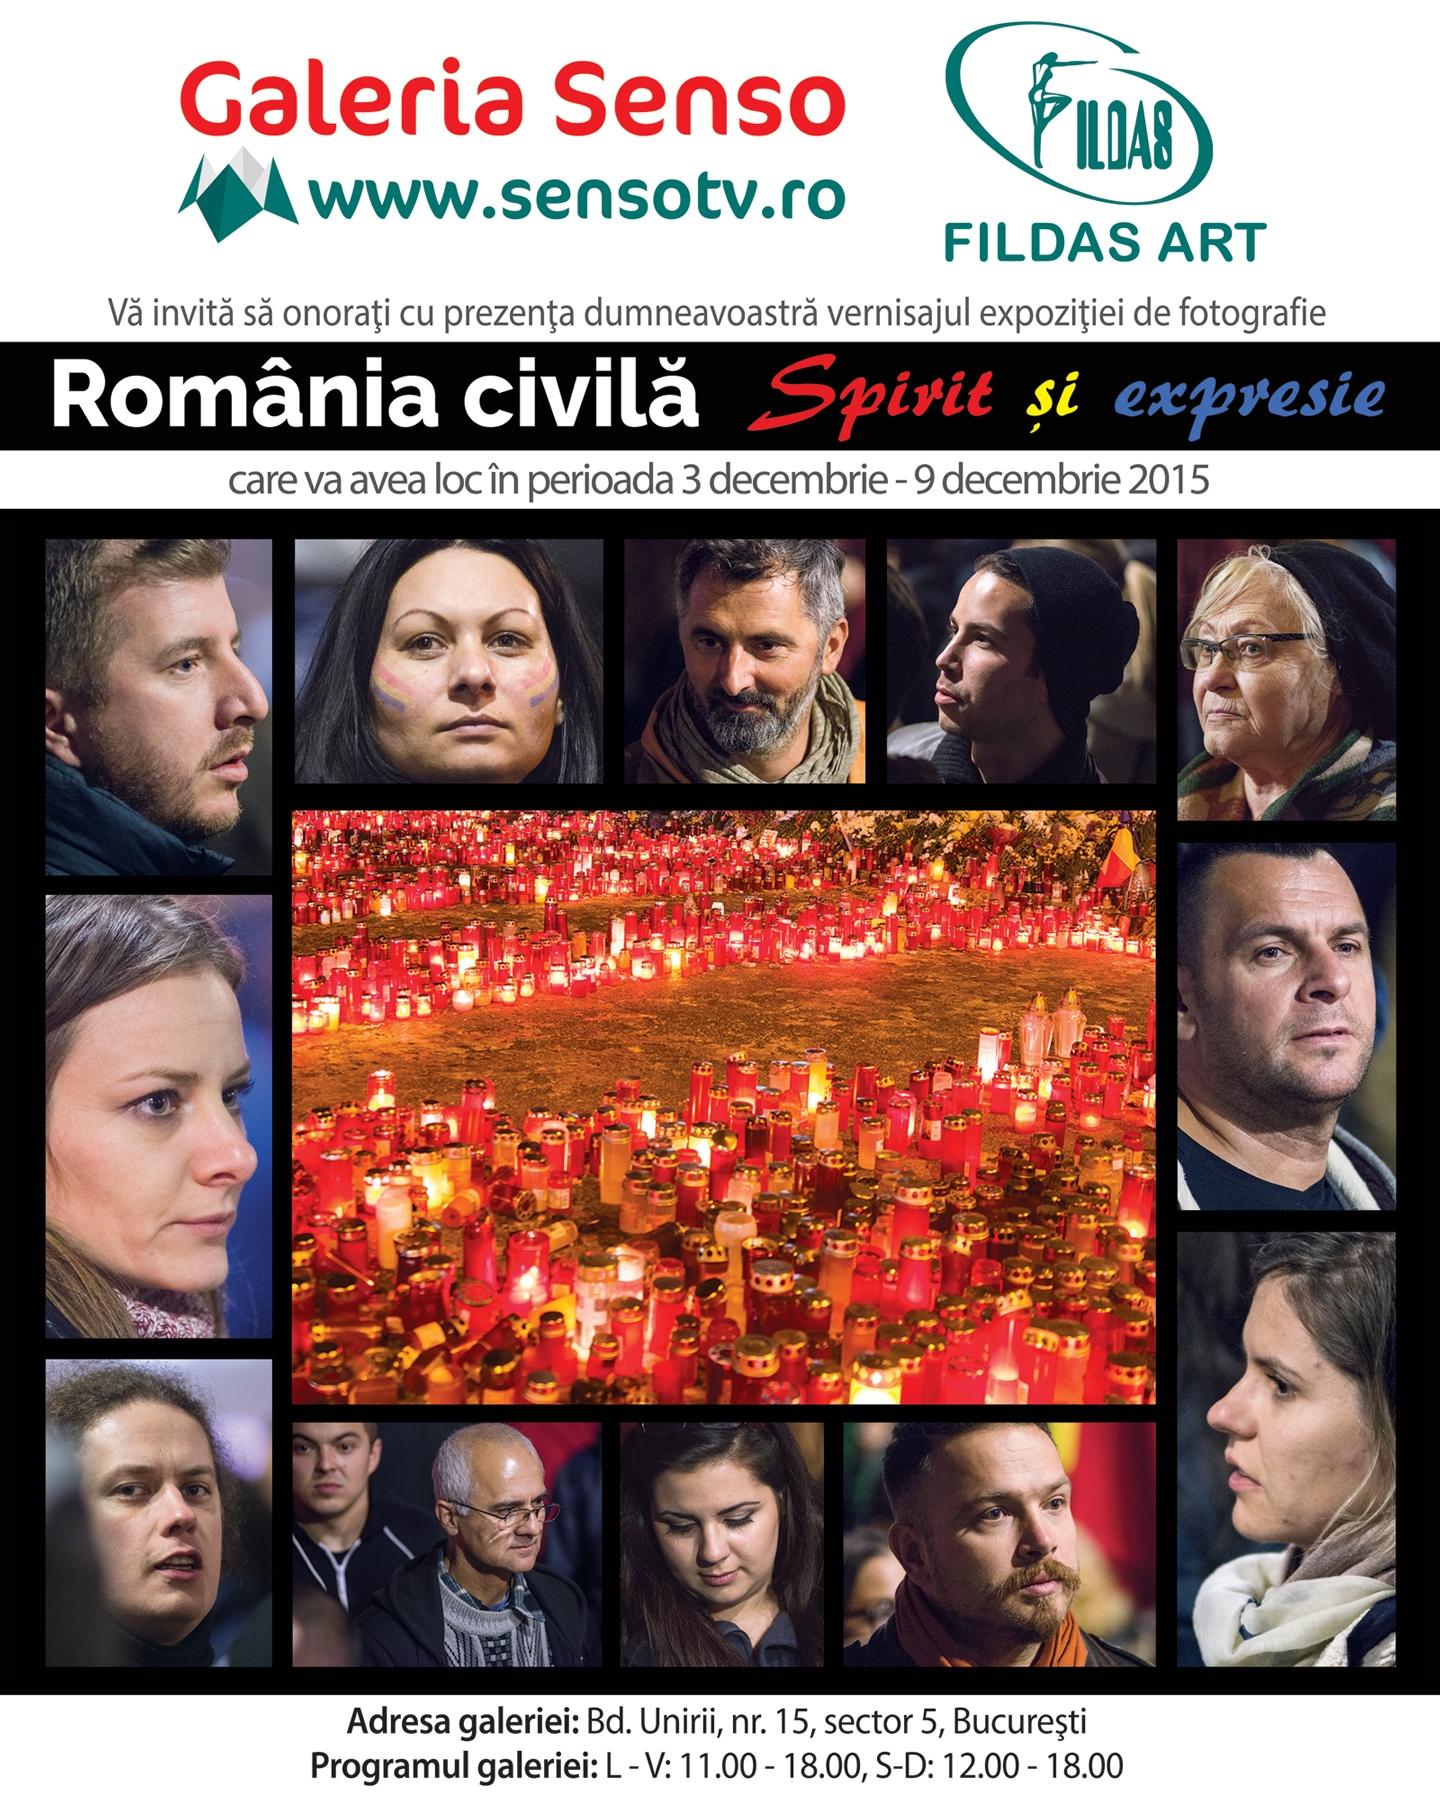 Afis_ROMANIA CIVILA Expozitie de fotografie